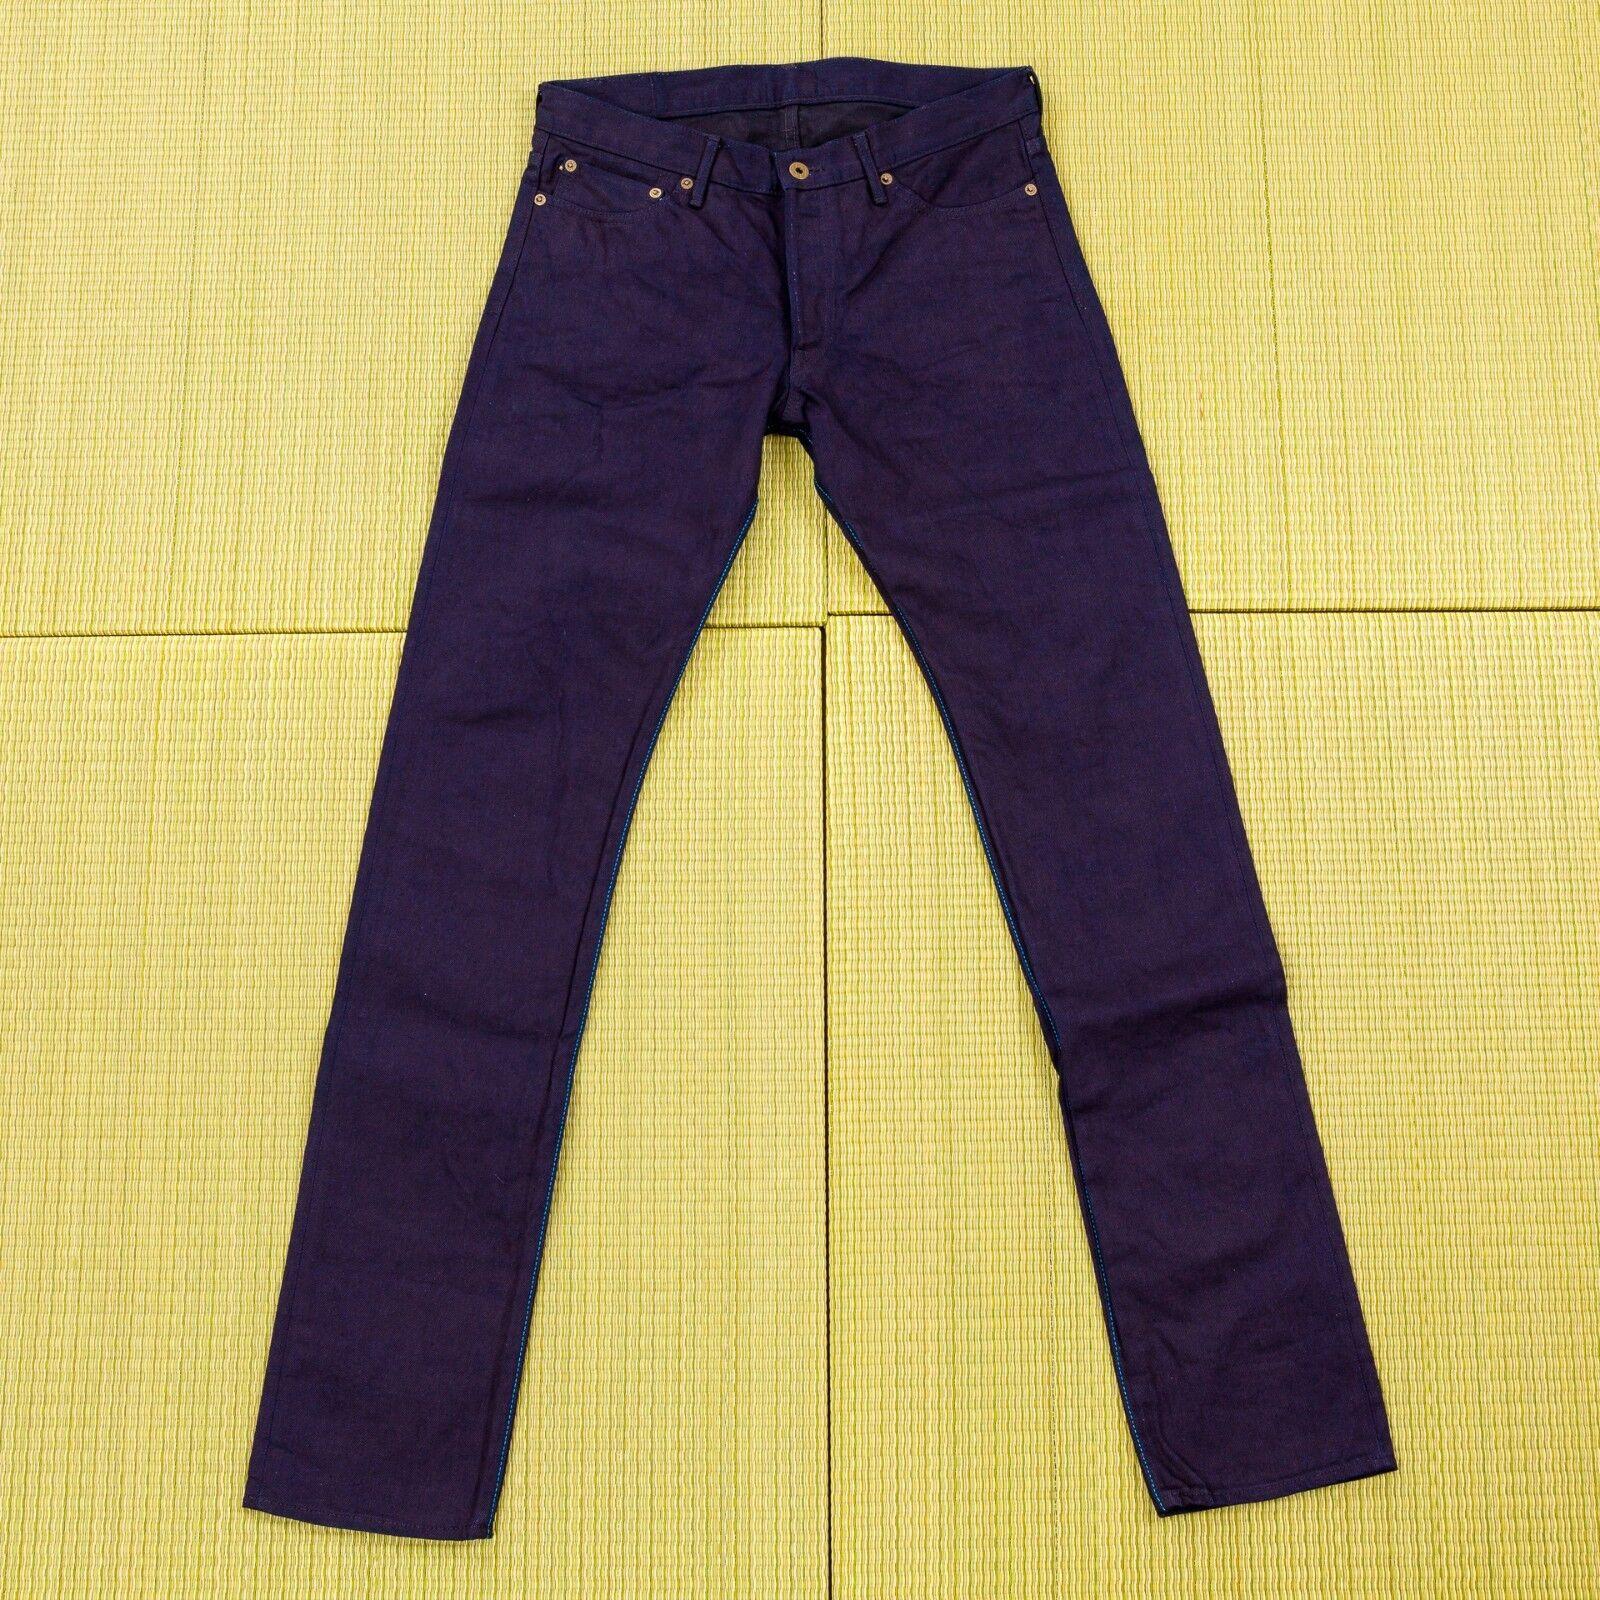 Japan bluee jeans denim pants for men new fashion button made in Kojima